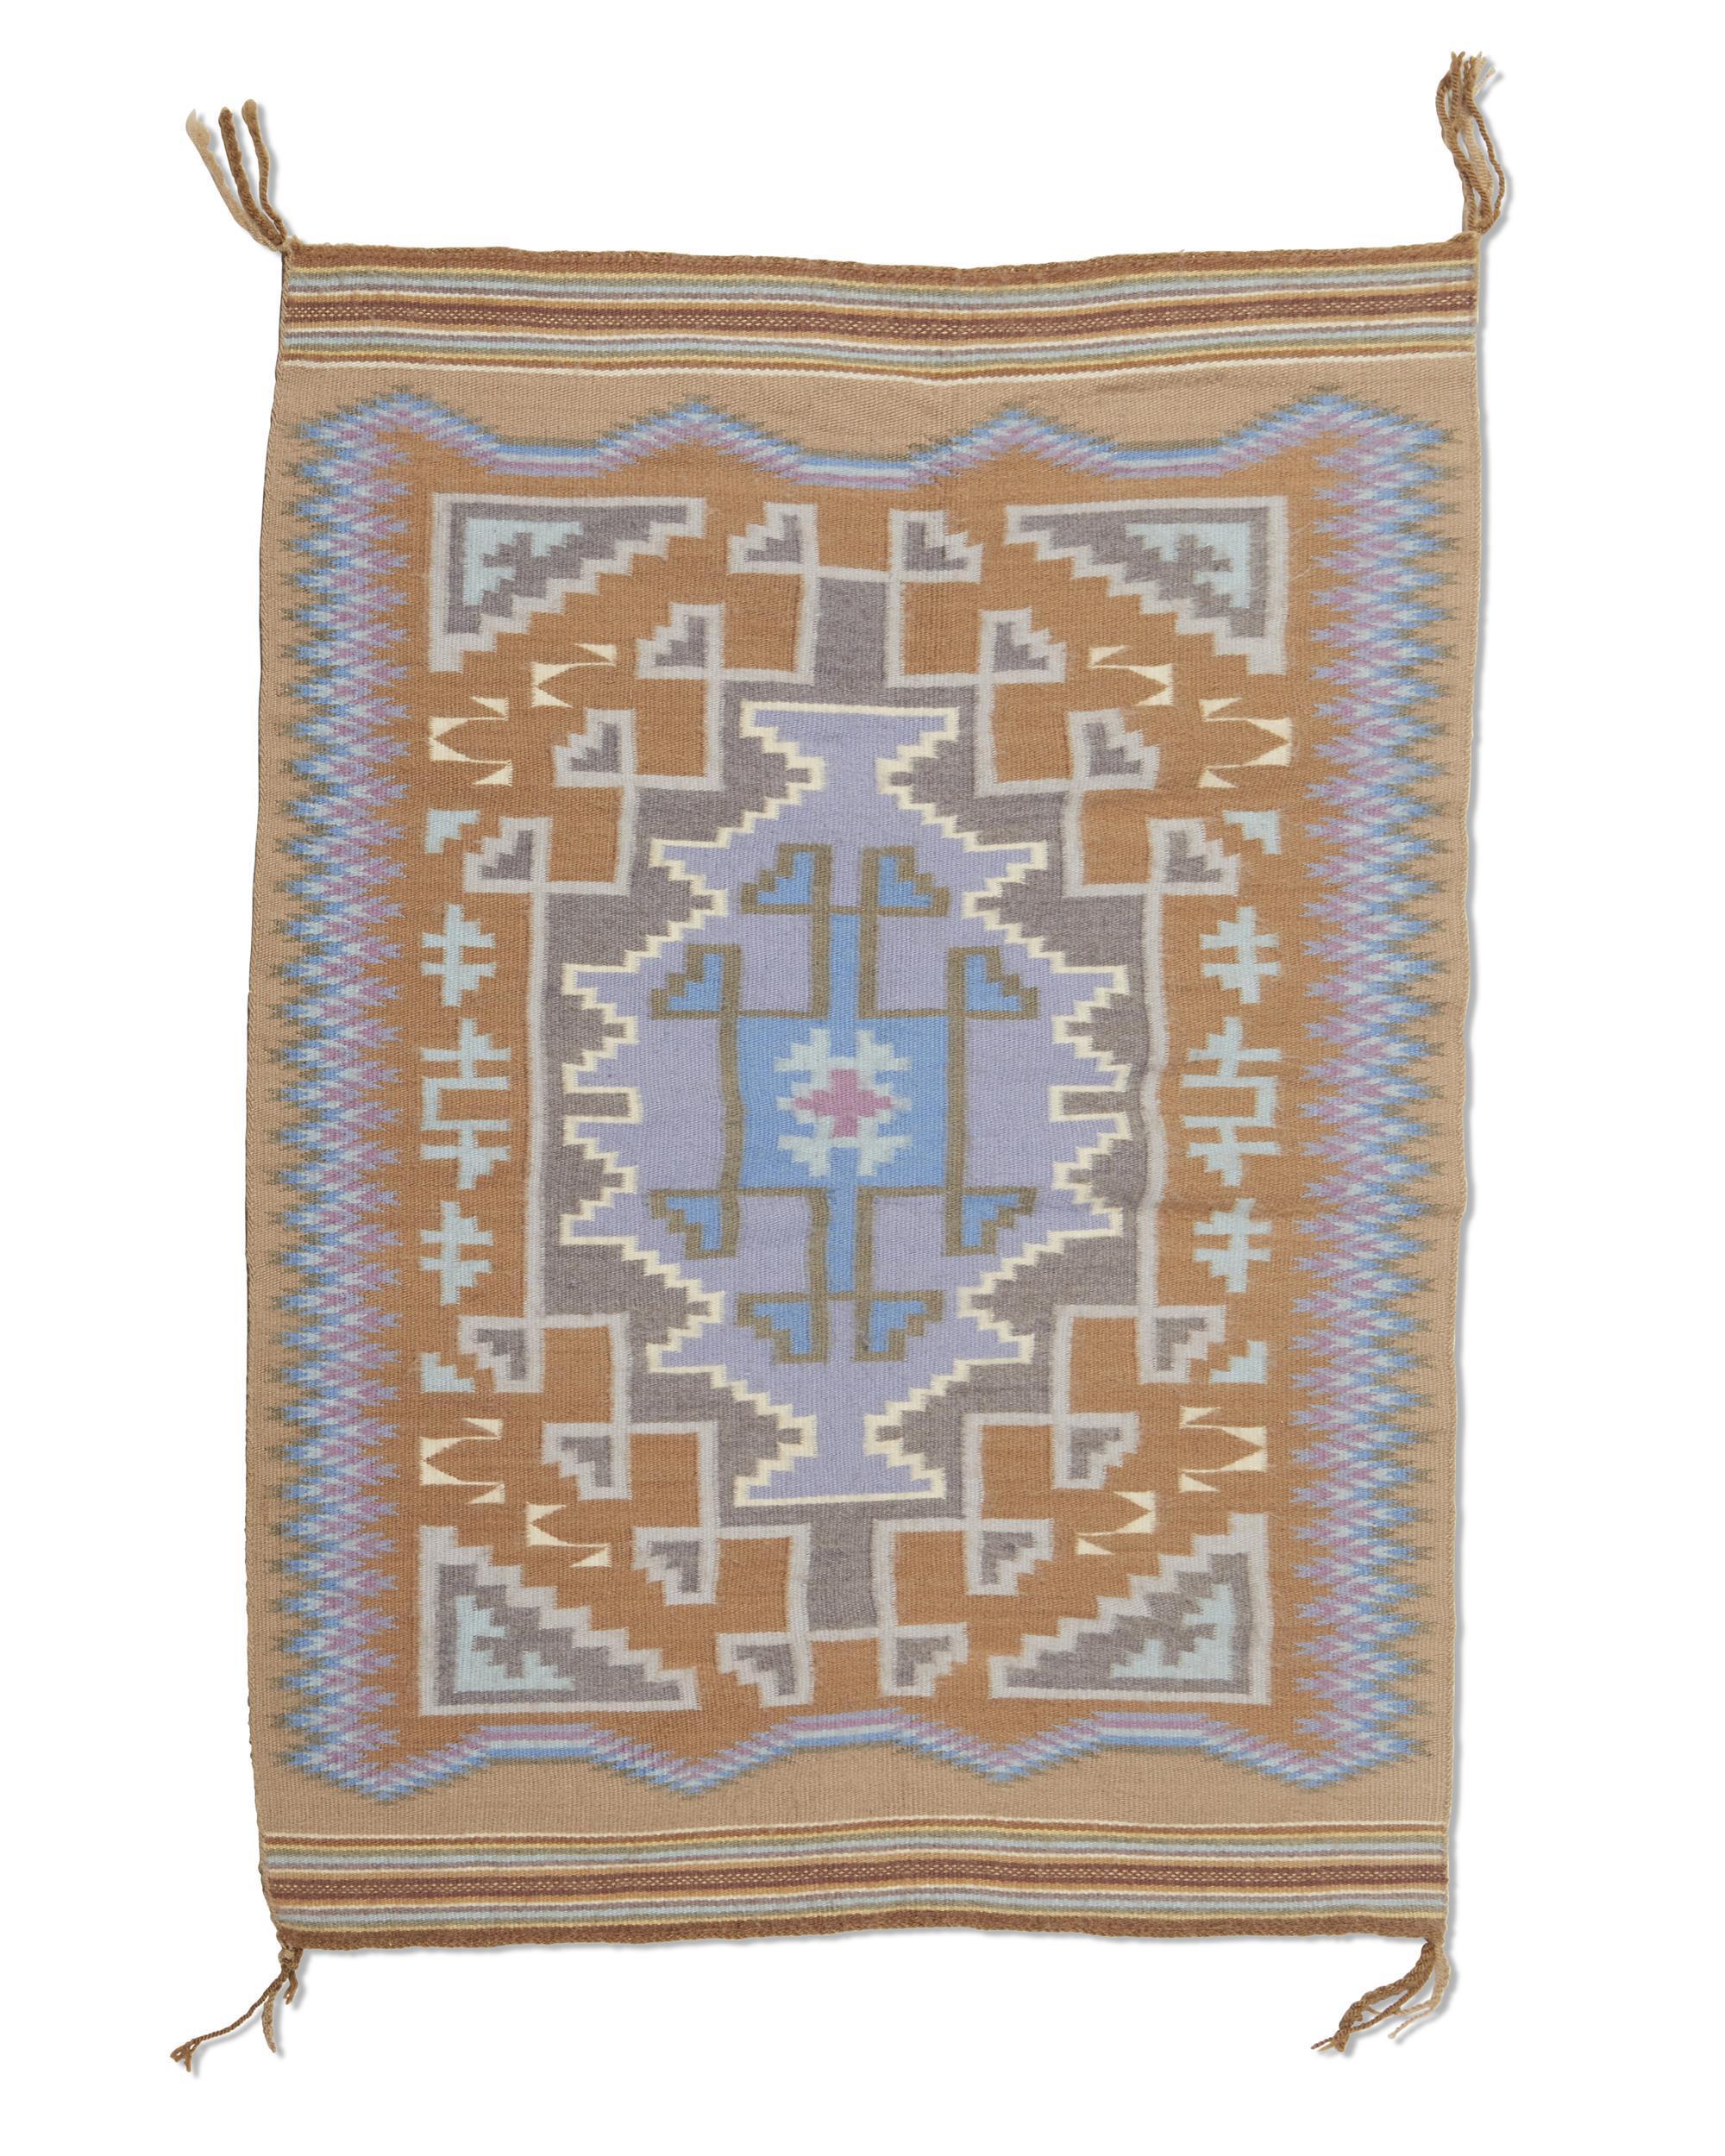 Three small Navajo Regional Rugs